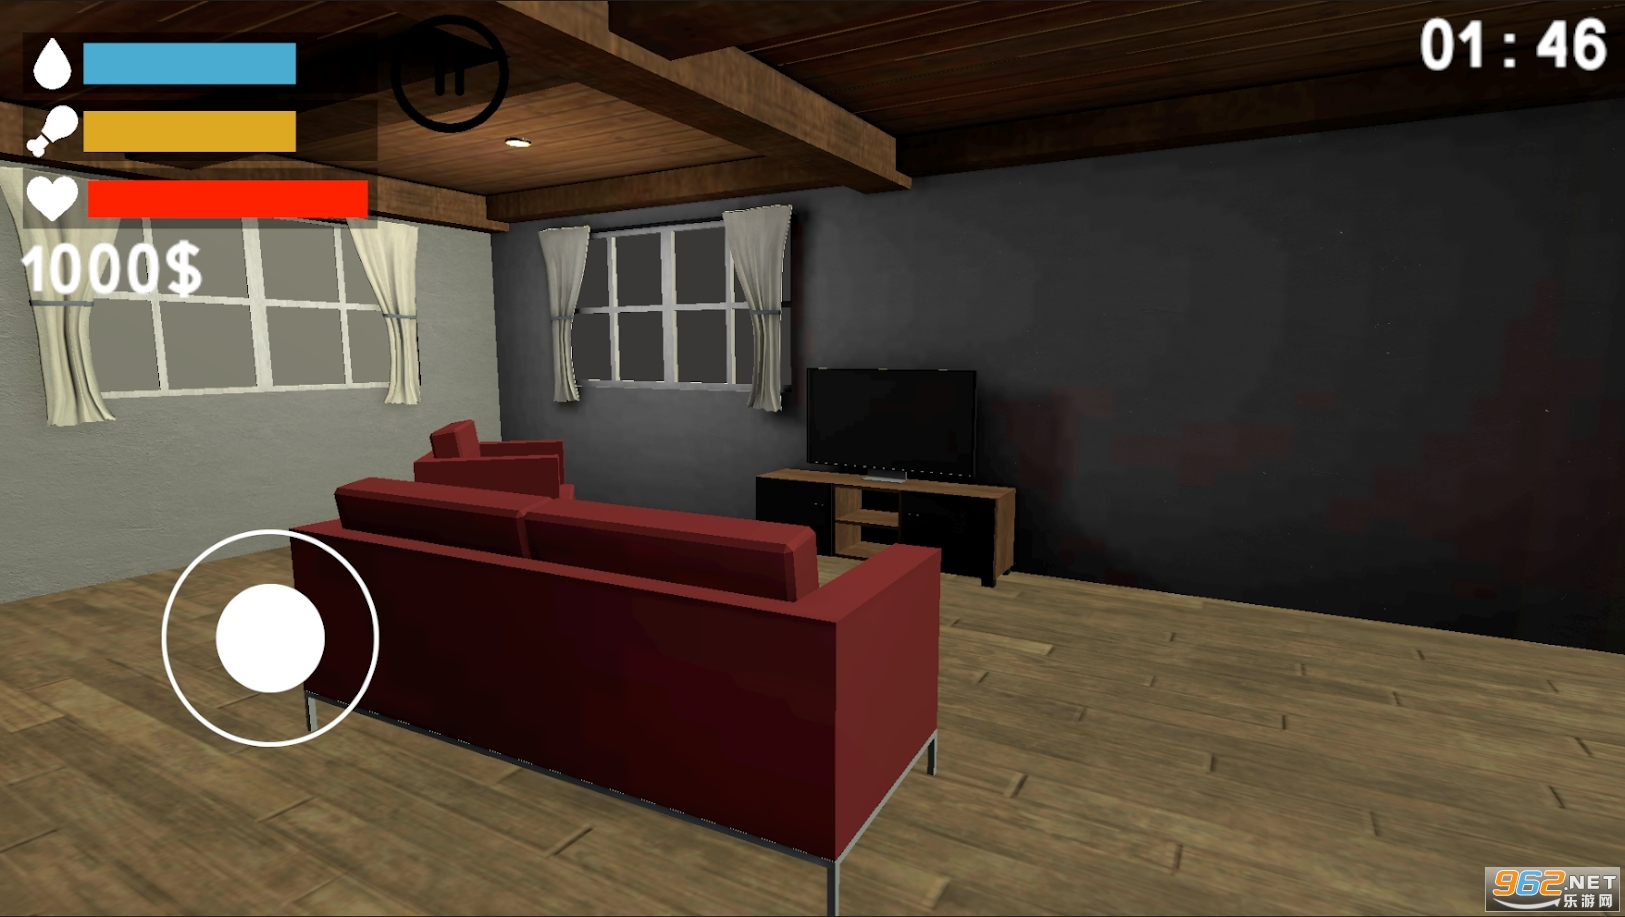 Hacker Simulator 3D游戏v1.0.5 最新版截图2